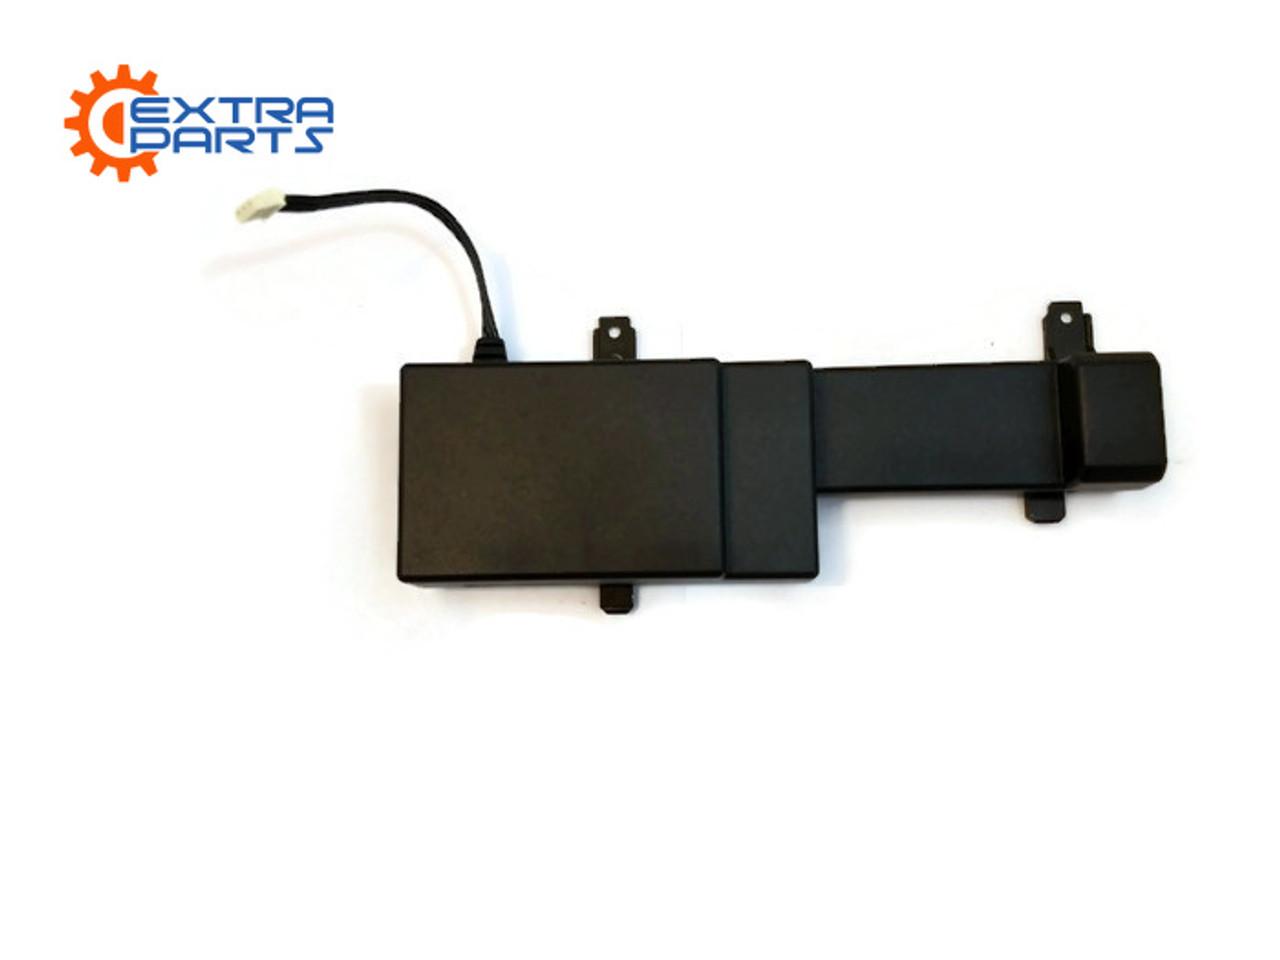 USA CQ890-67001 Ampxl Carriage Zim Sensor Sv for HP Designjet T120 T520 GENUINE